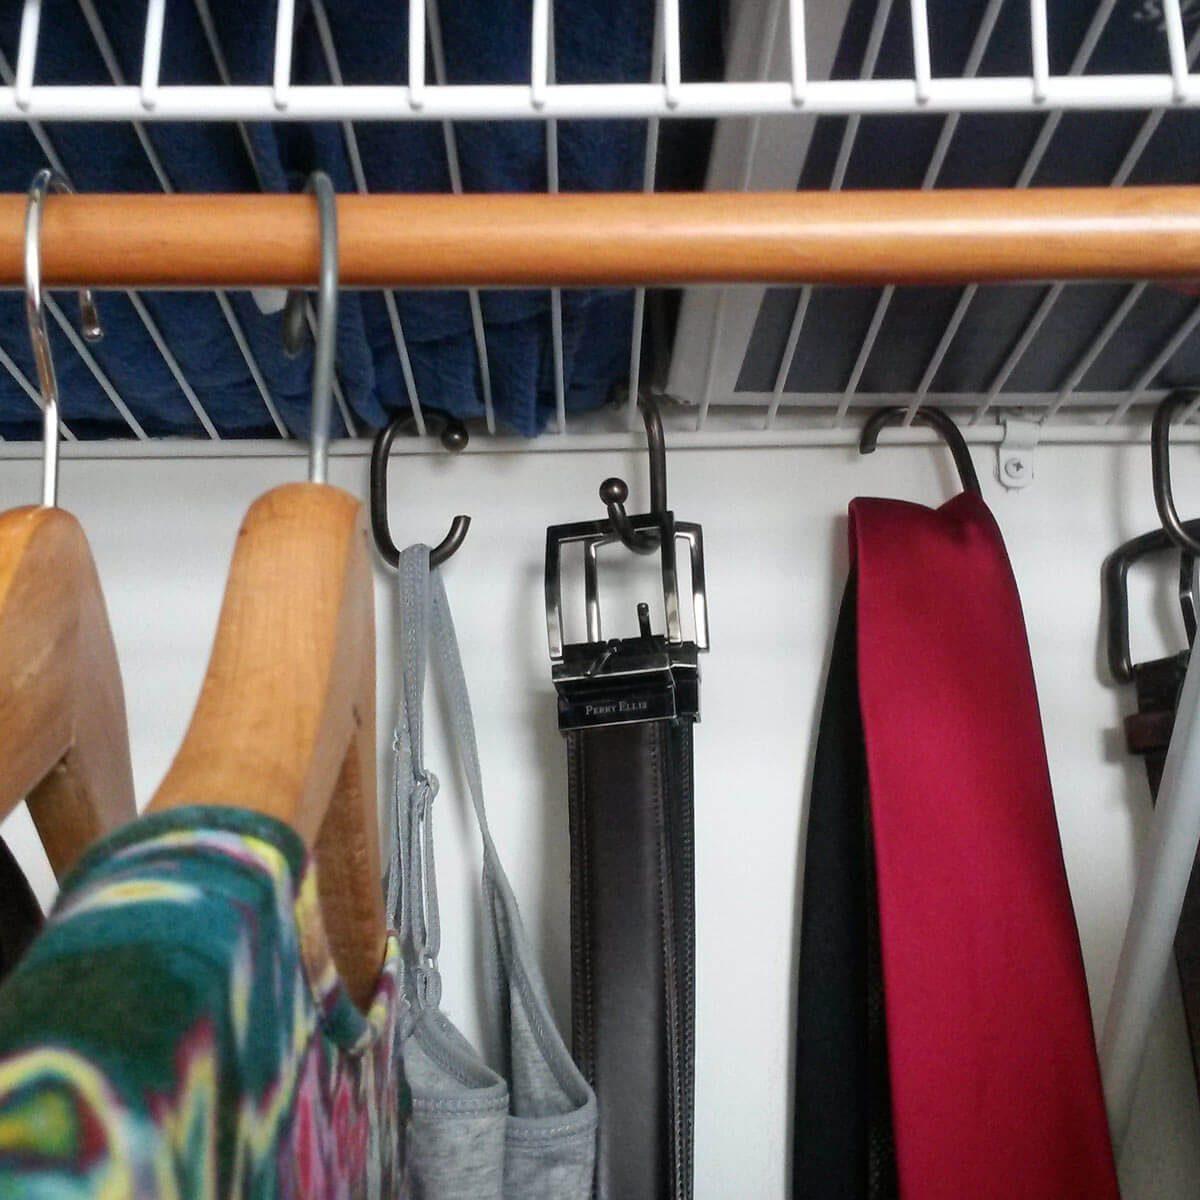 wireshelf closet organization